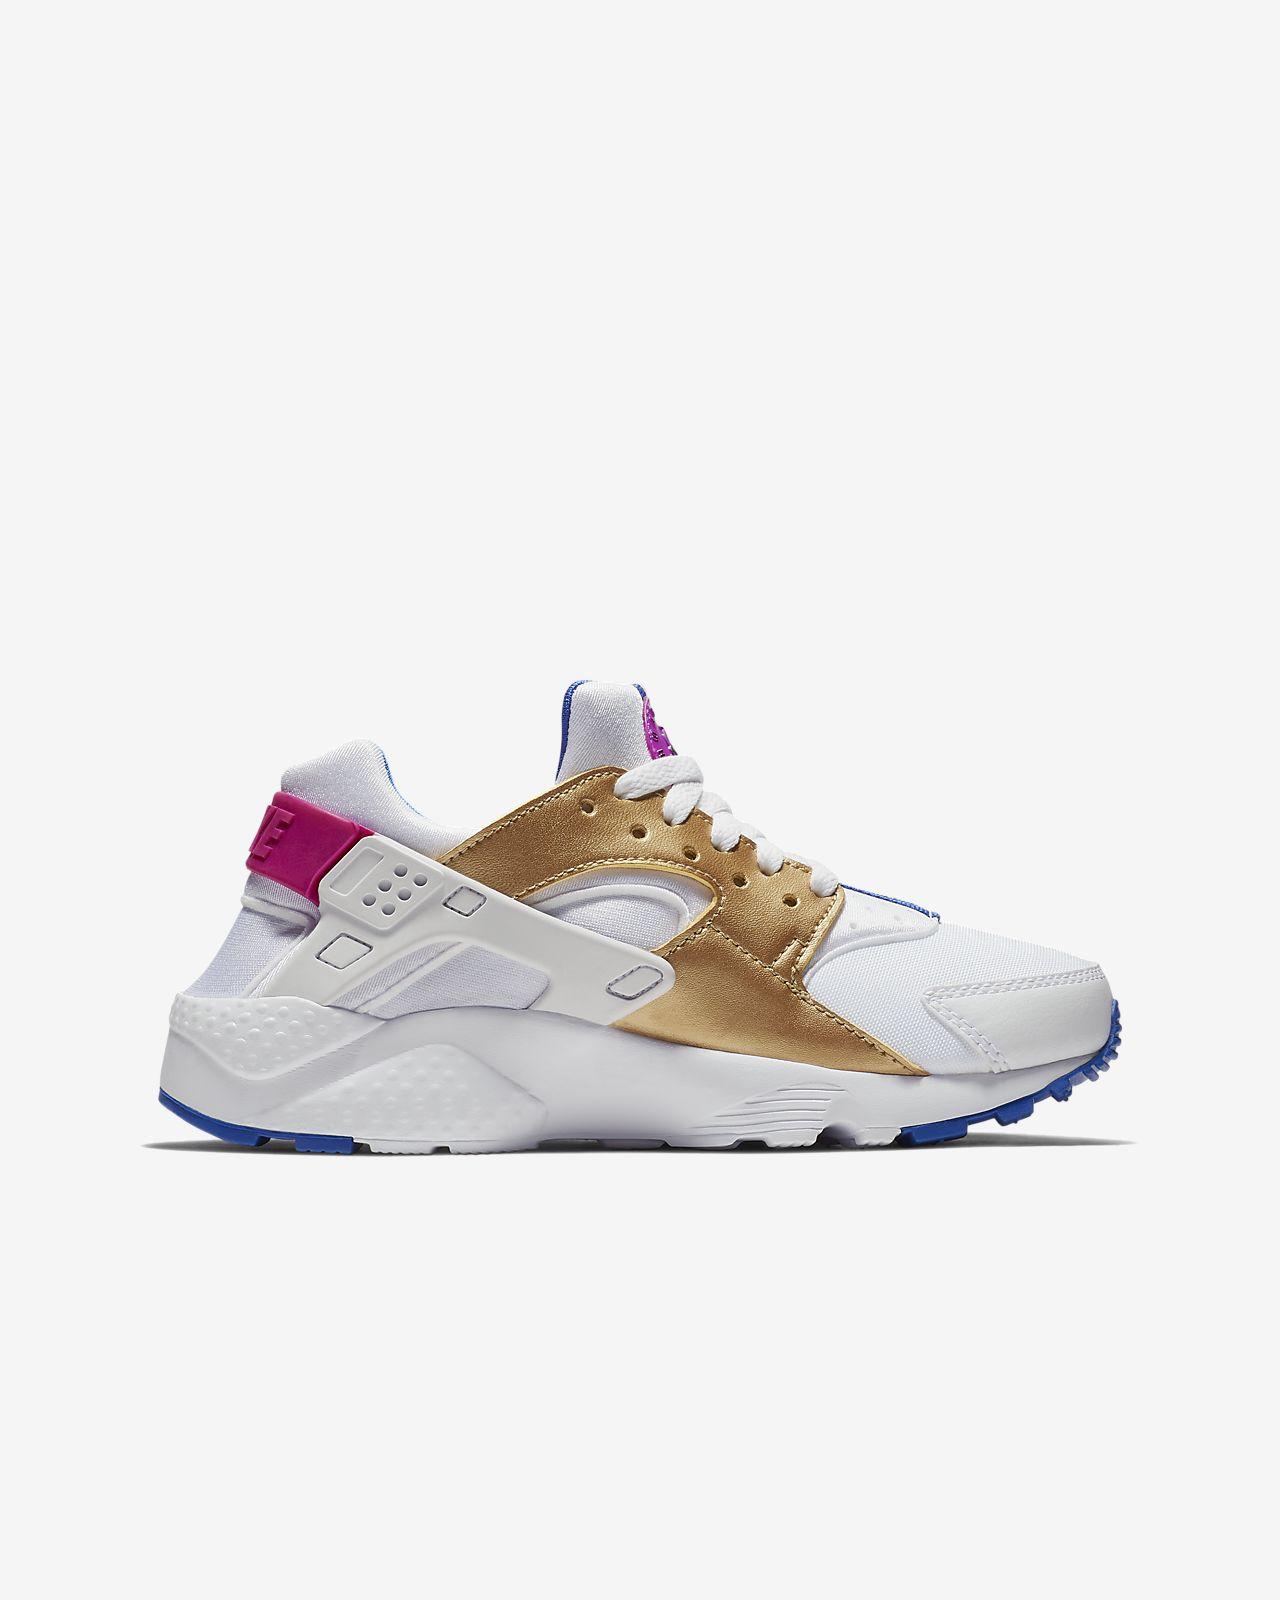 ... Nike Huarache Schuh für ältere Kinder